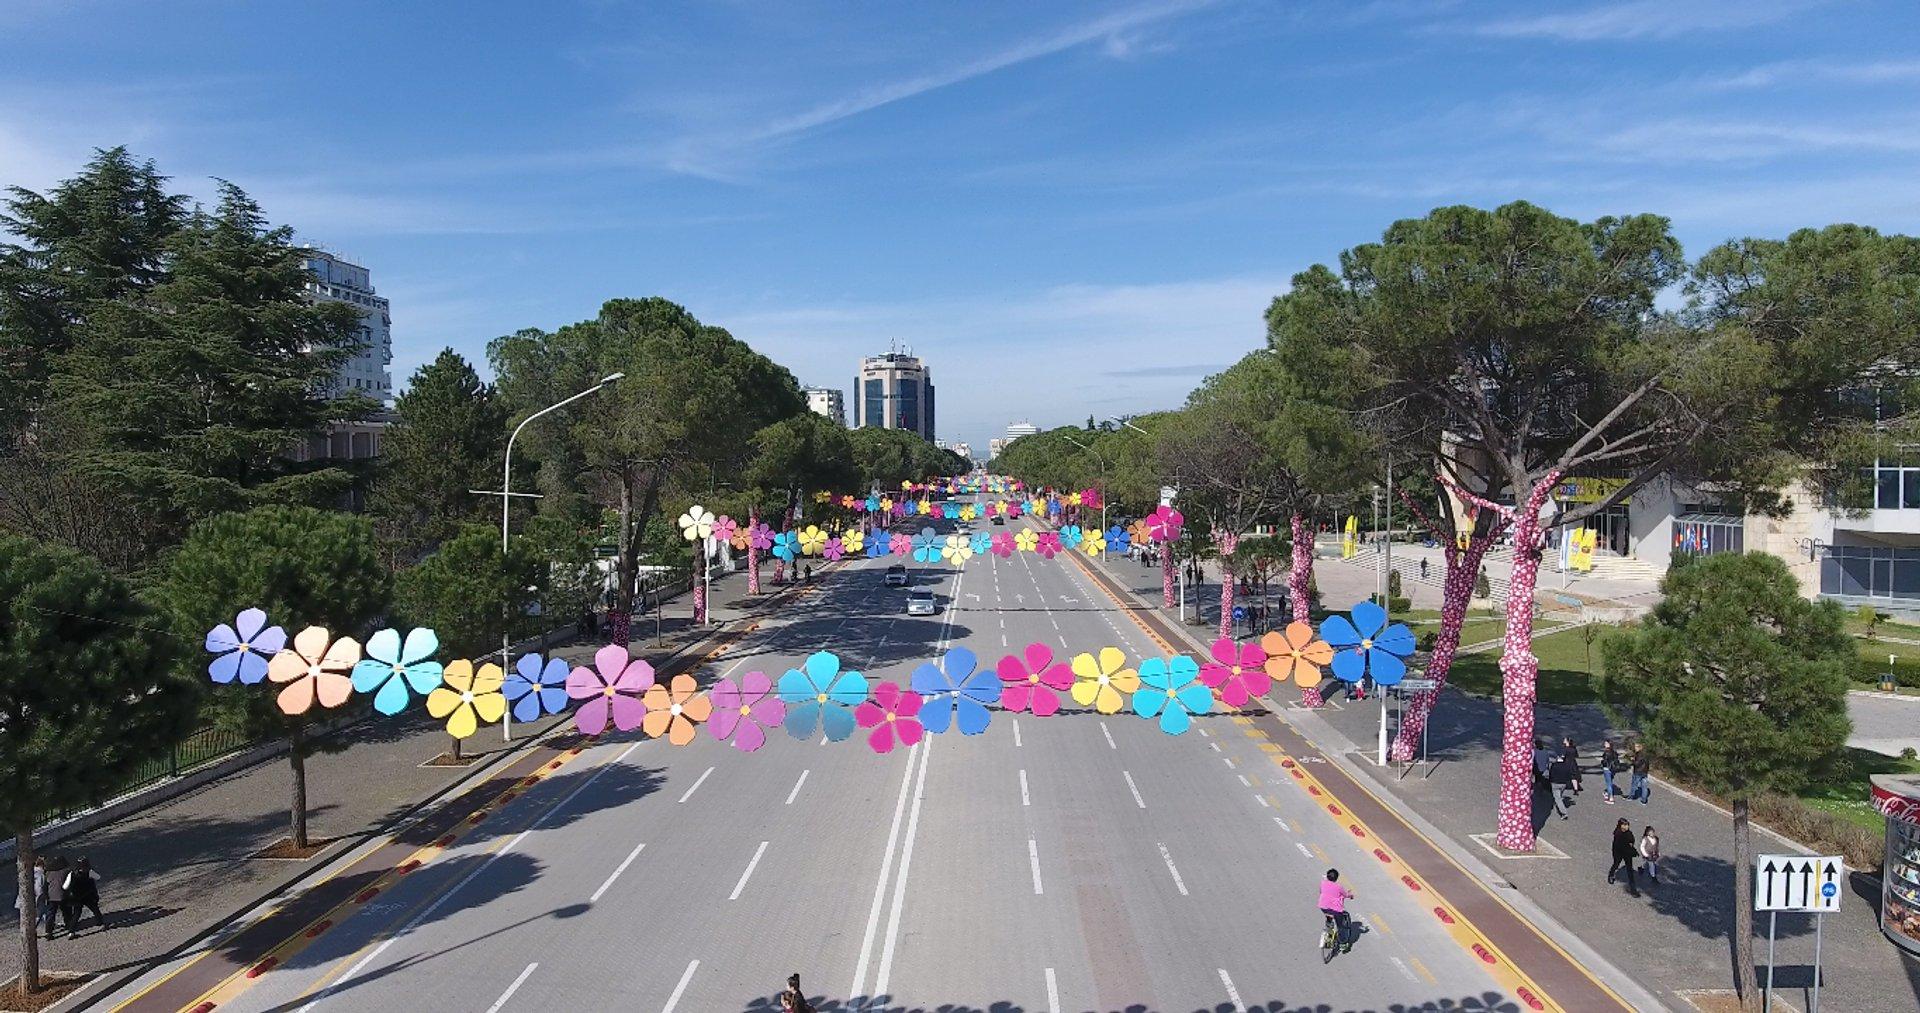 Summer Day (Dita e Verës) in Albania - Best Season 2020